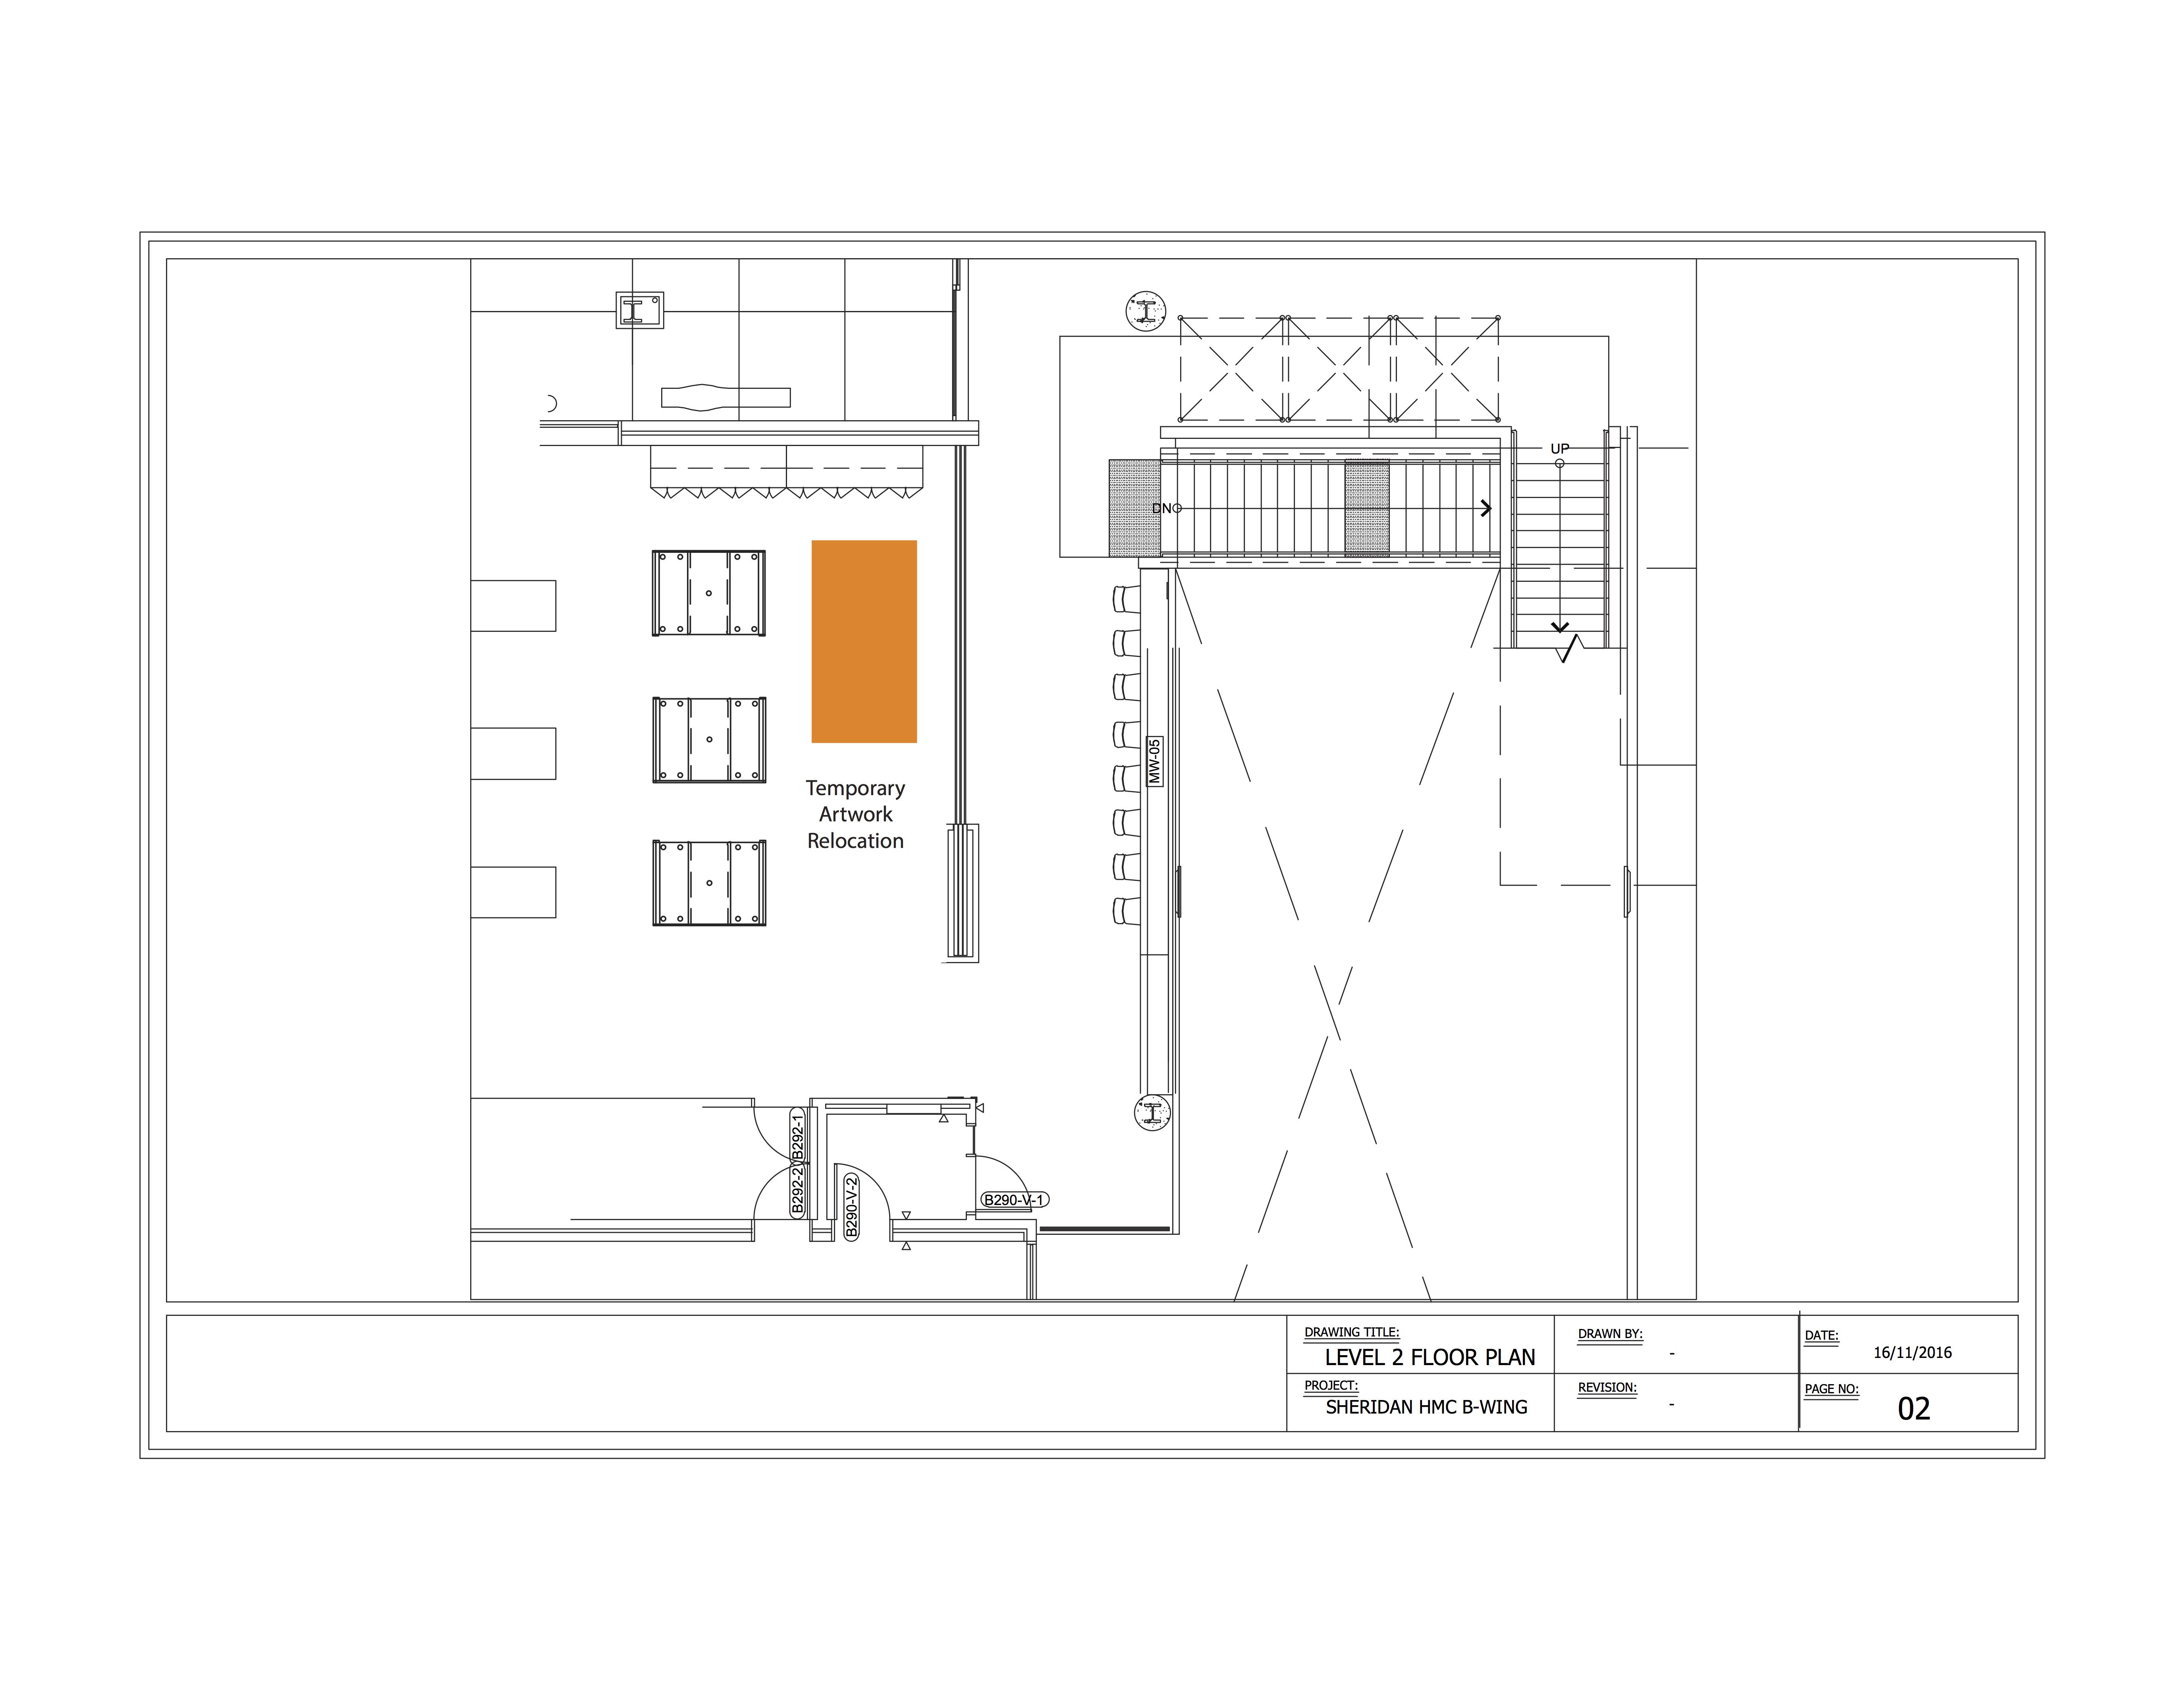 Possible Temporary Artwork Relocation Area, Level 2 Floorplan, Sheridan HMC B-Wing